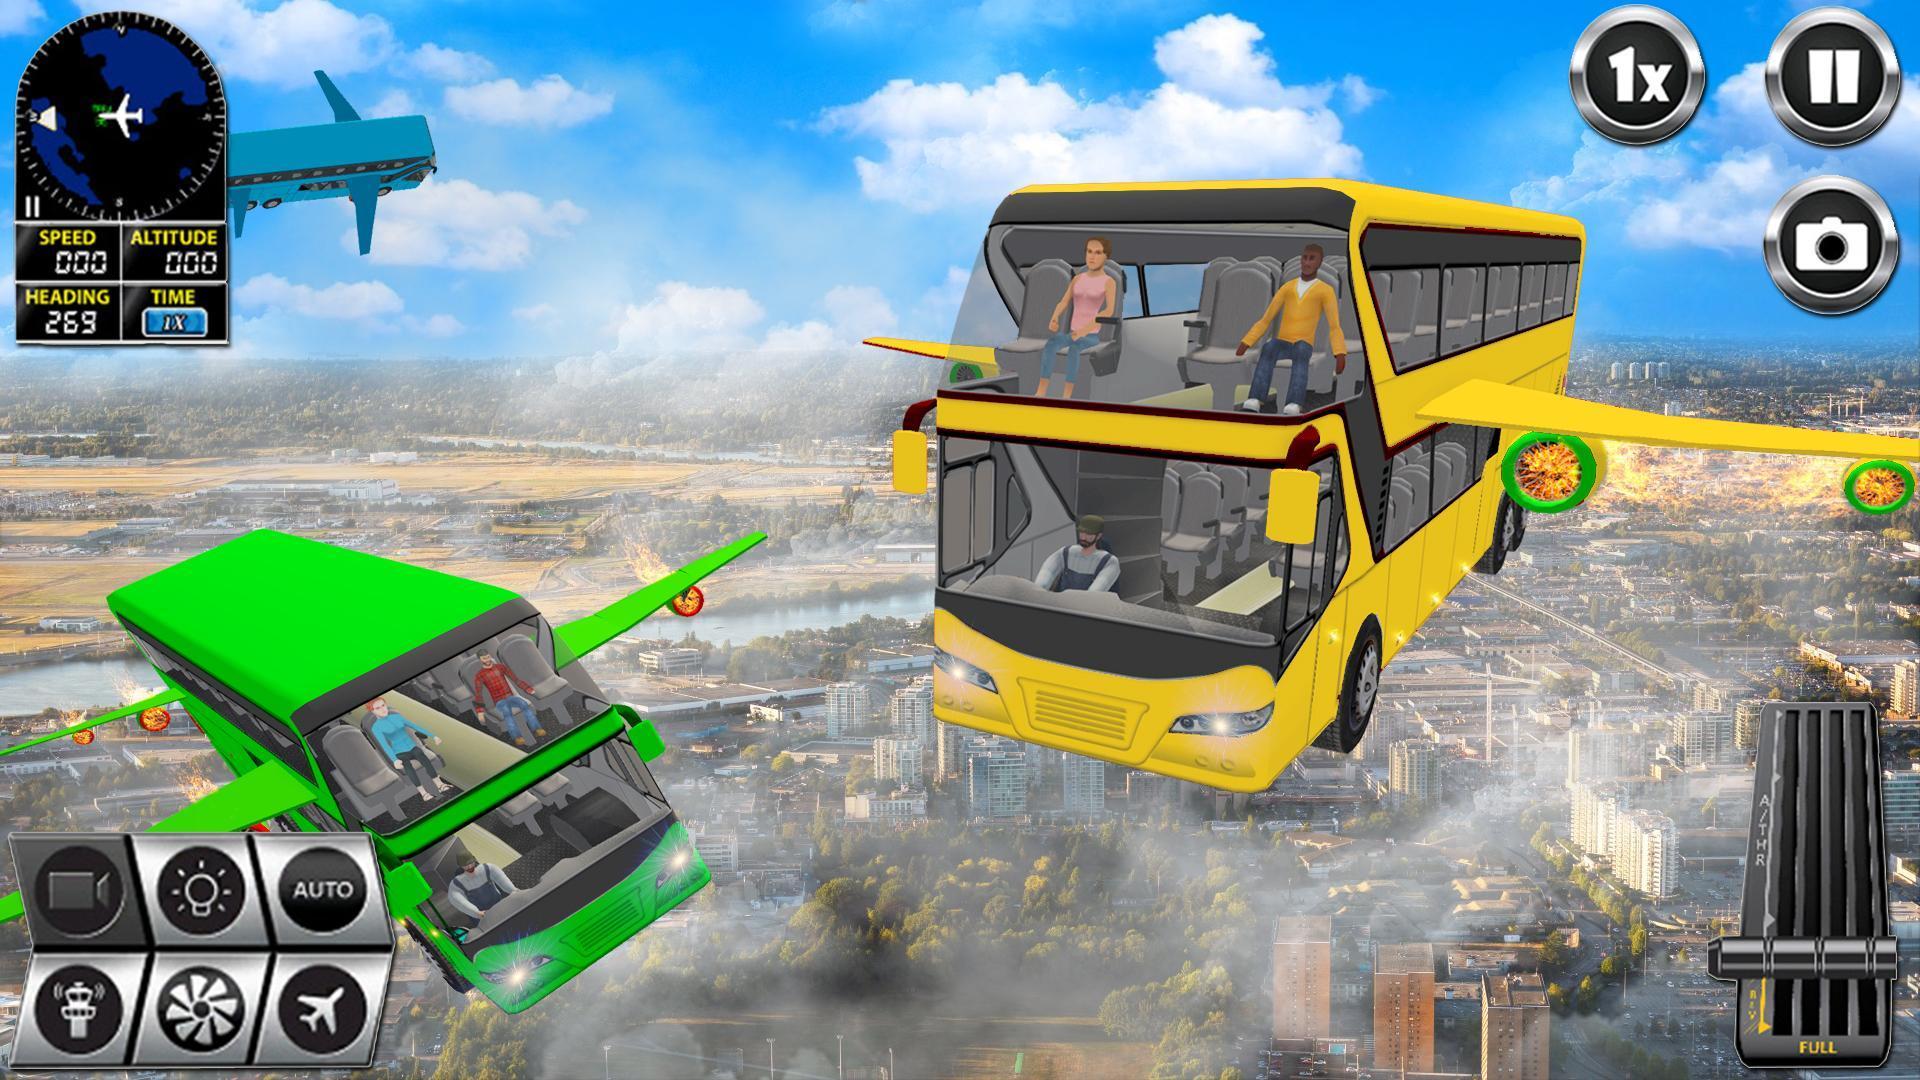 Flying Bus Driving simulator 2019: Free Bus Games 2.8 Screenshot 3